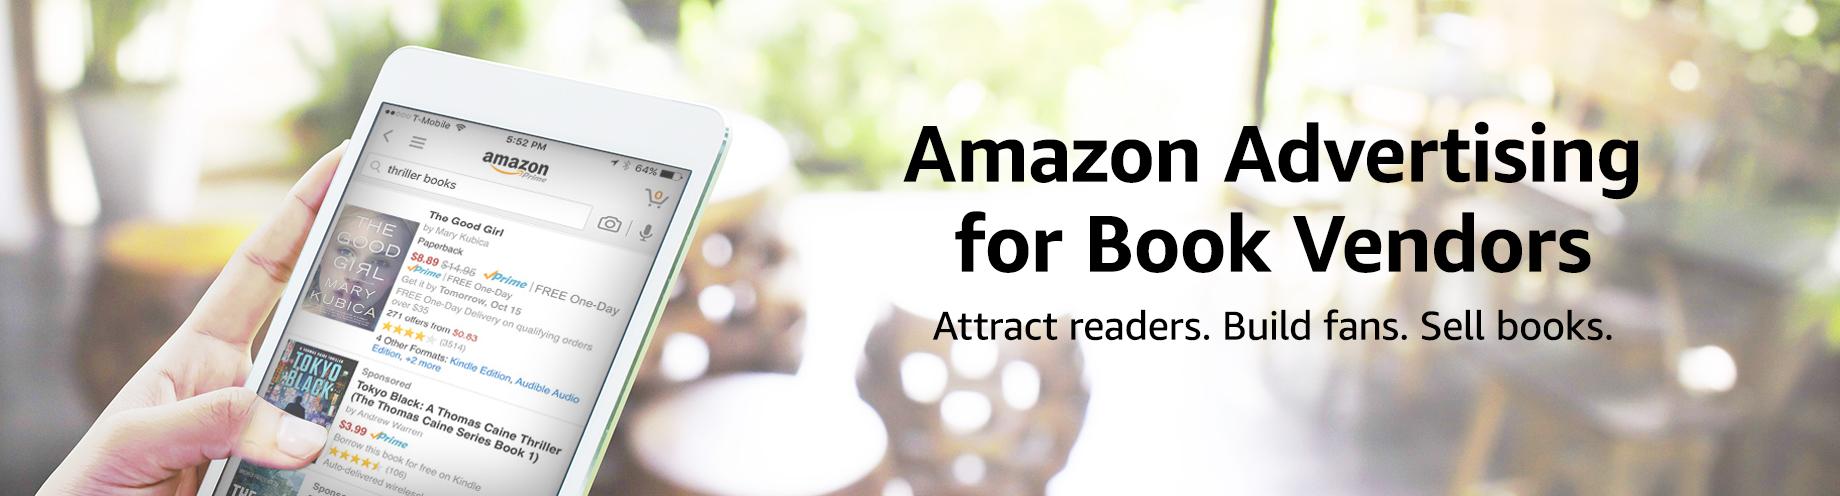 Amazon Marketing Services for Book Vendors